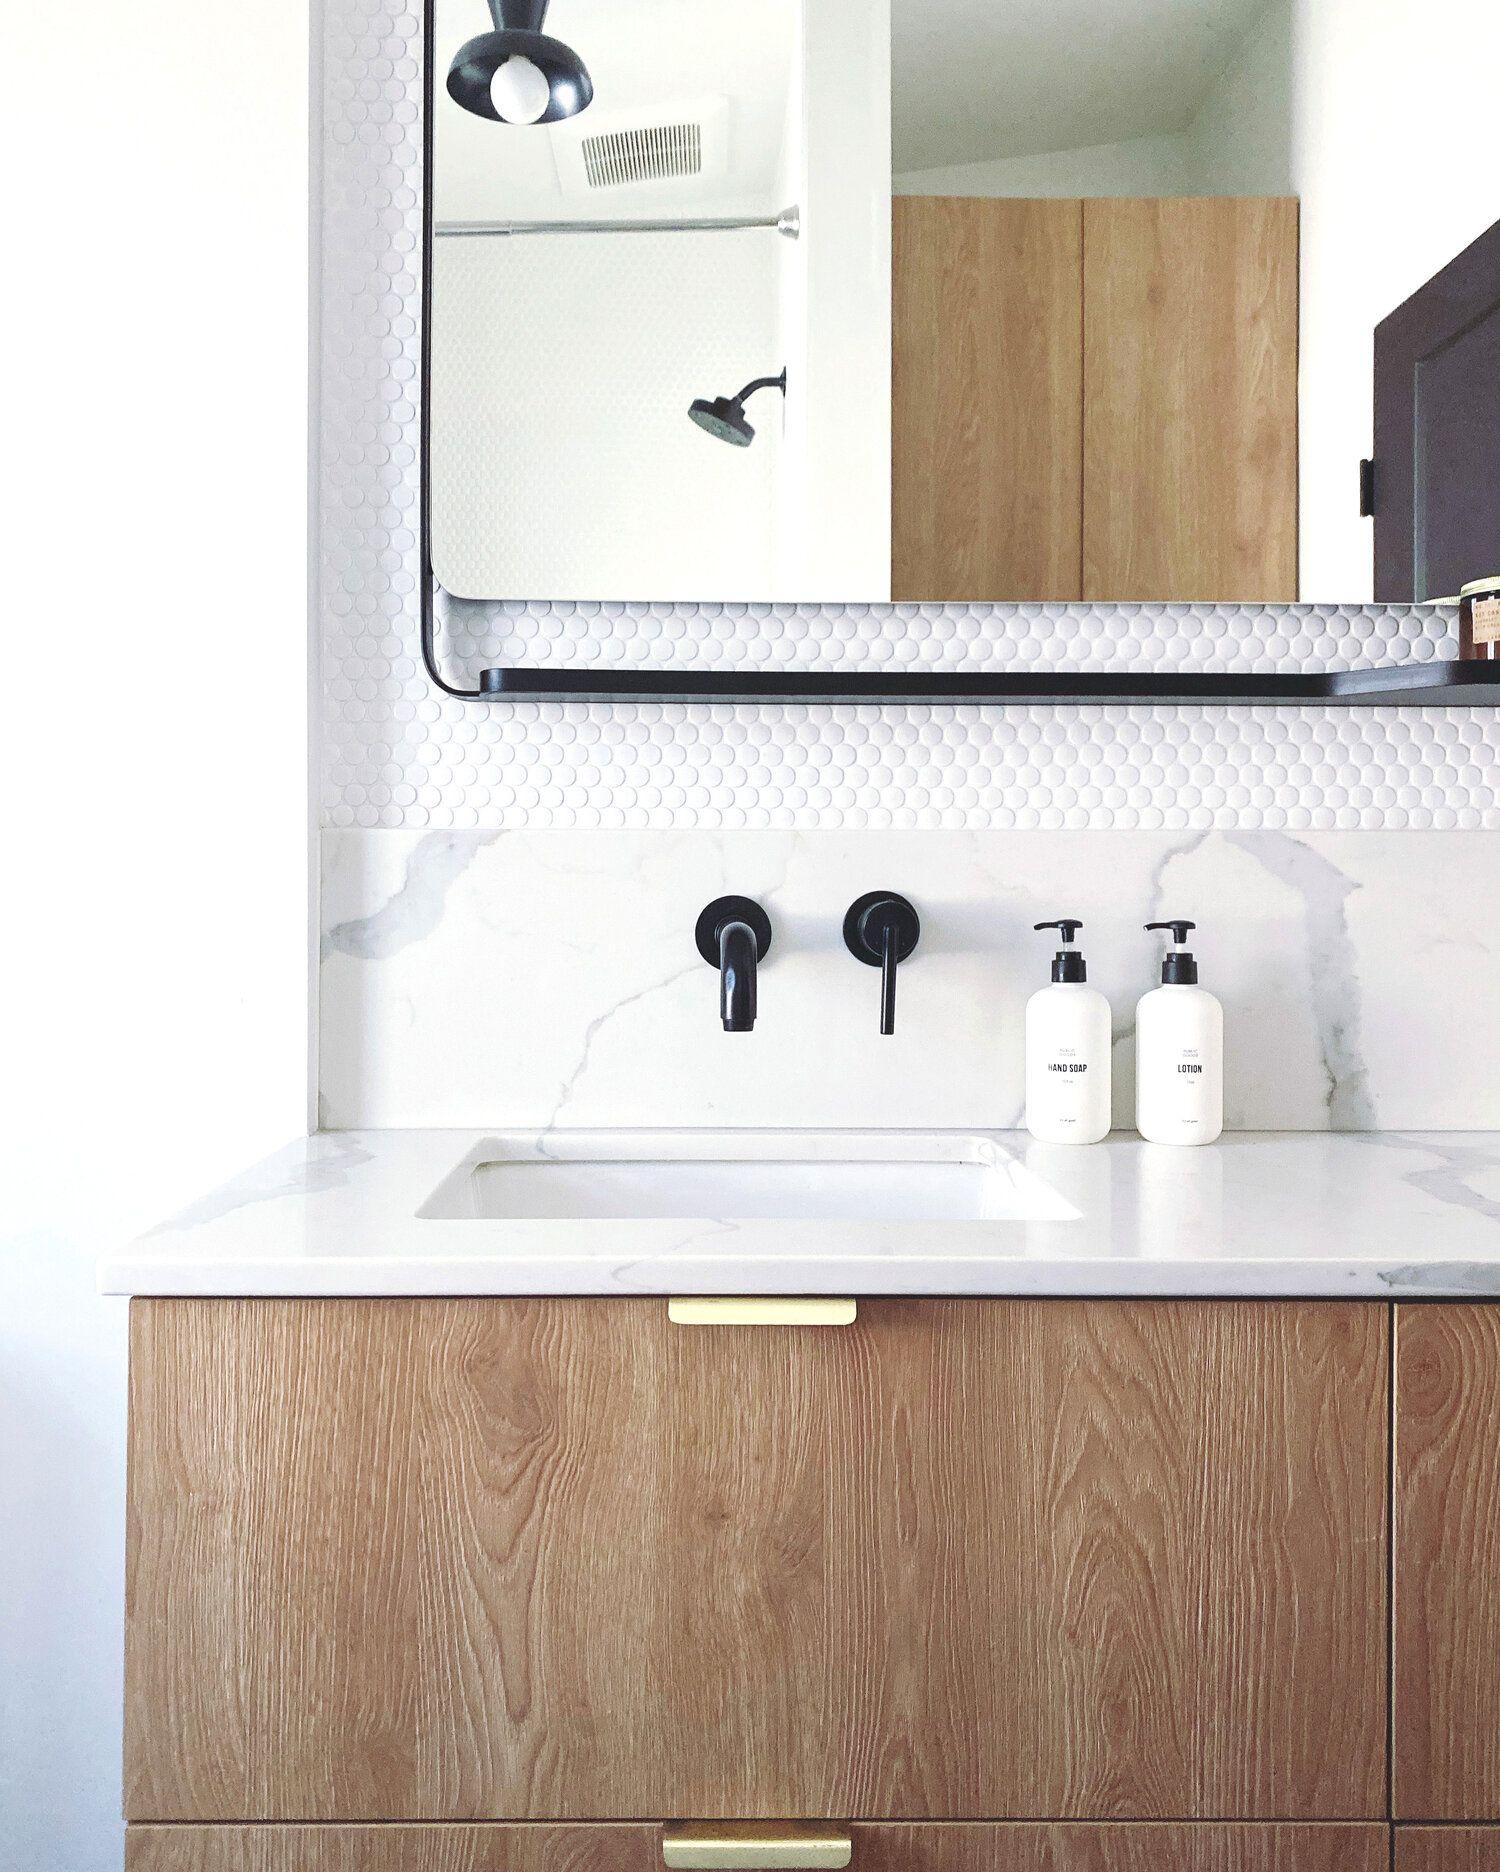 Customizing Ikea Godmorgon Vanity Its Leal Love In 2020 Ikea Godmorgon Ikea Bathroom Glamorous Bathroom Decor